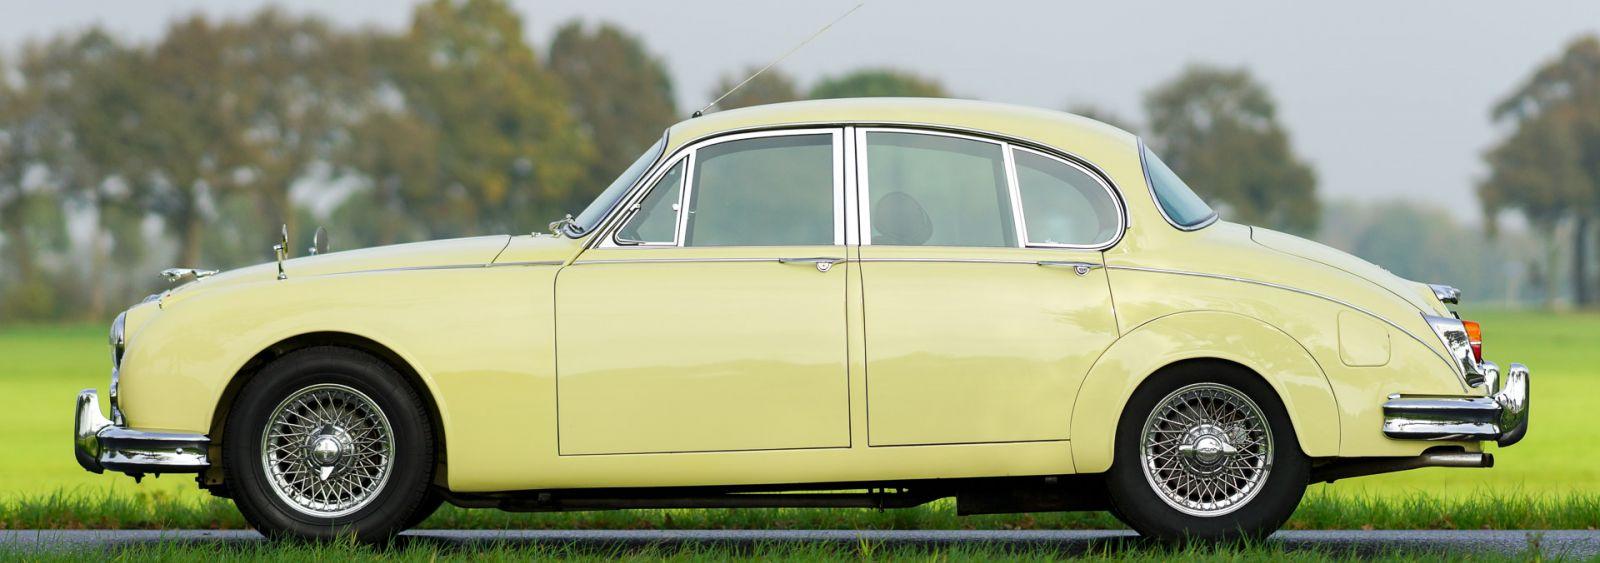 Jaguar Mk II 3.8 Litre, 1966 - Classicargarage - DE